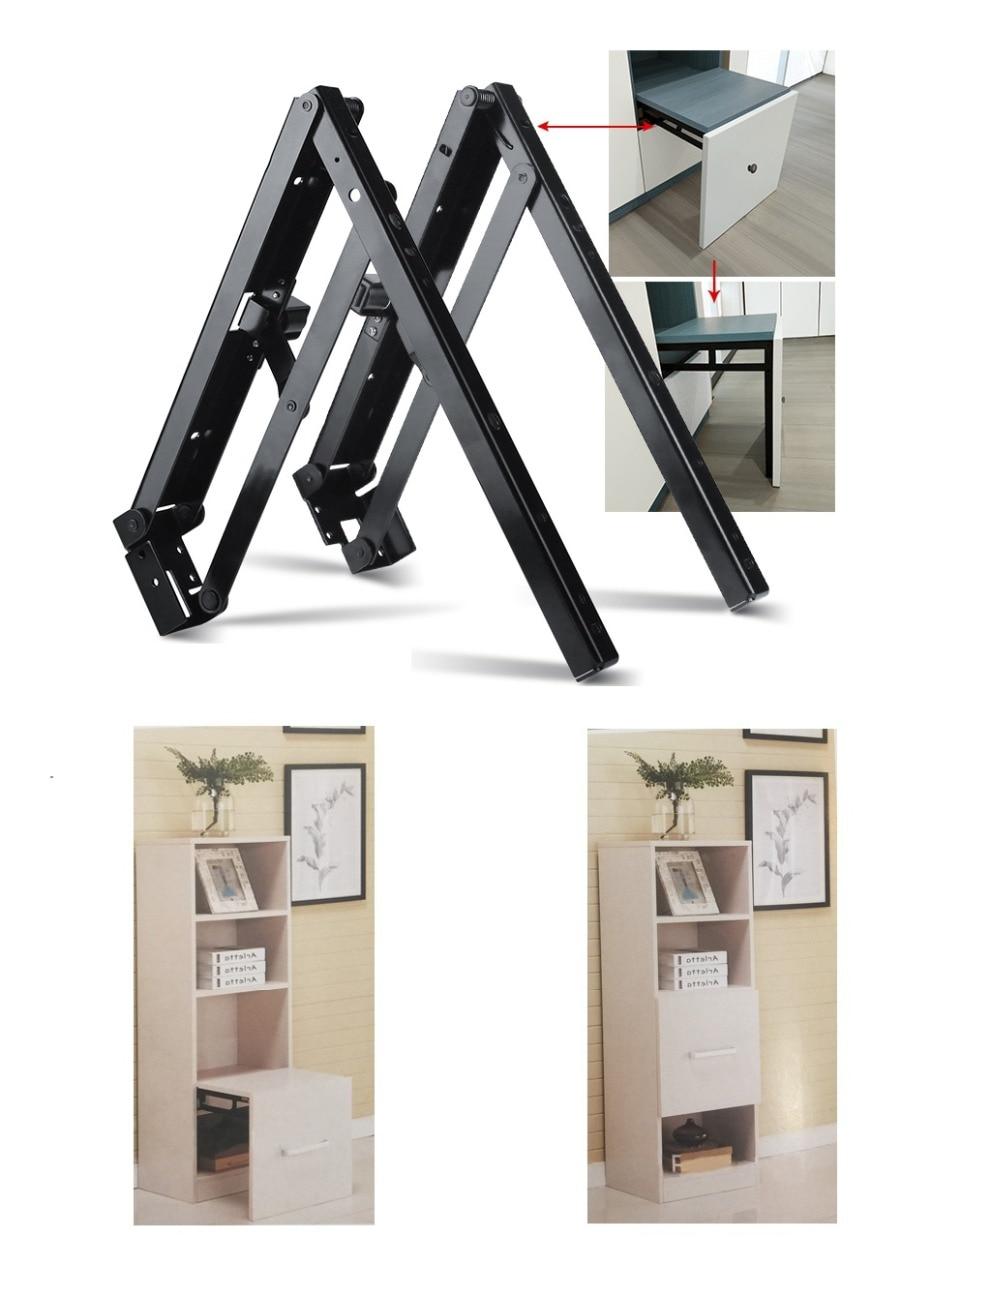 1Pair(2 PCS)/Lot Conceal Folding Seat Stool Bracket Hinge RV Shelf Support Shoe cabinet wardrobe closet stool shoe putting on